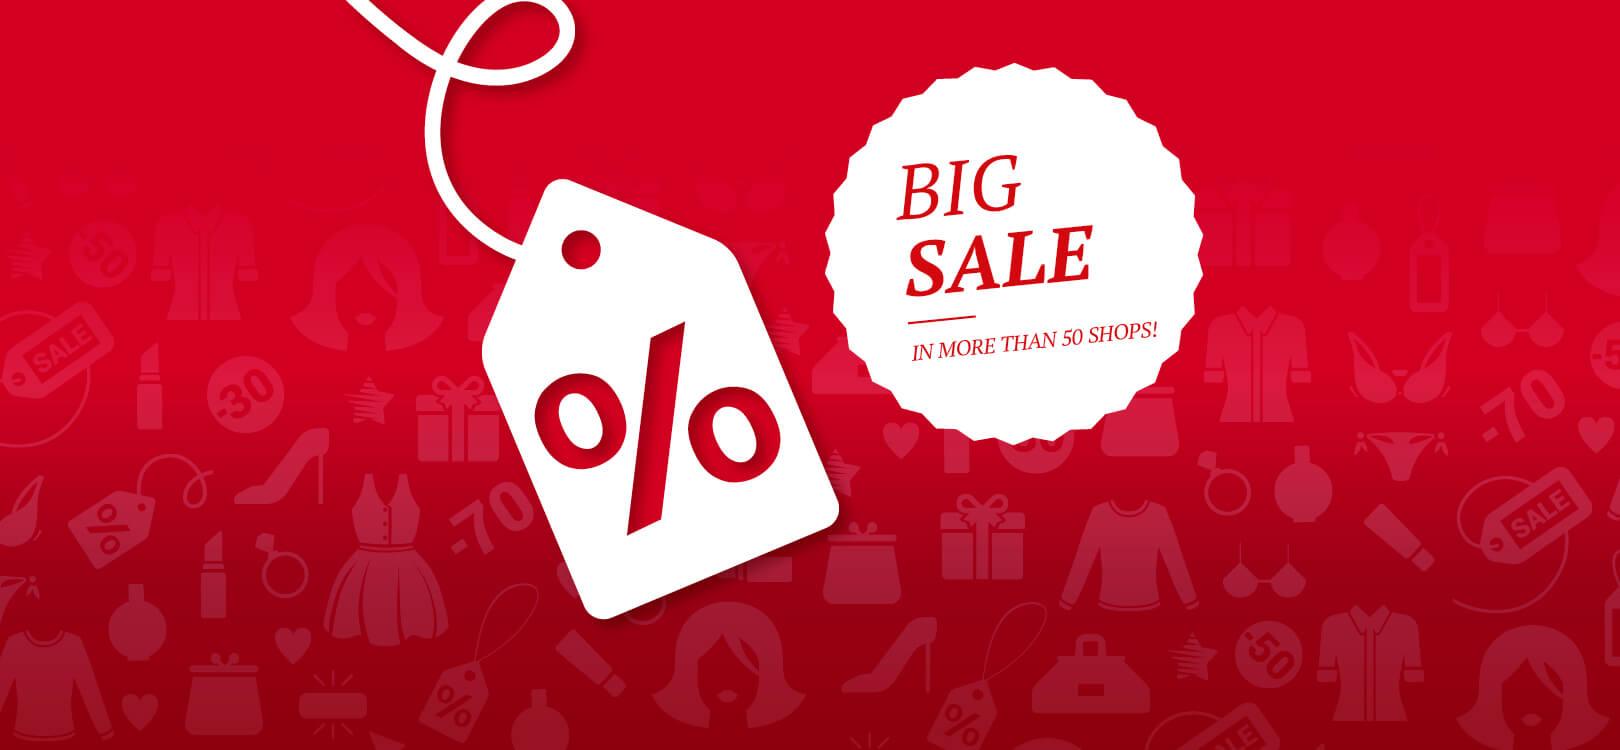 Big Sale at Kaufhaus Tyrol